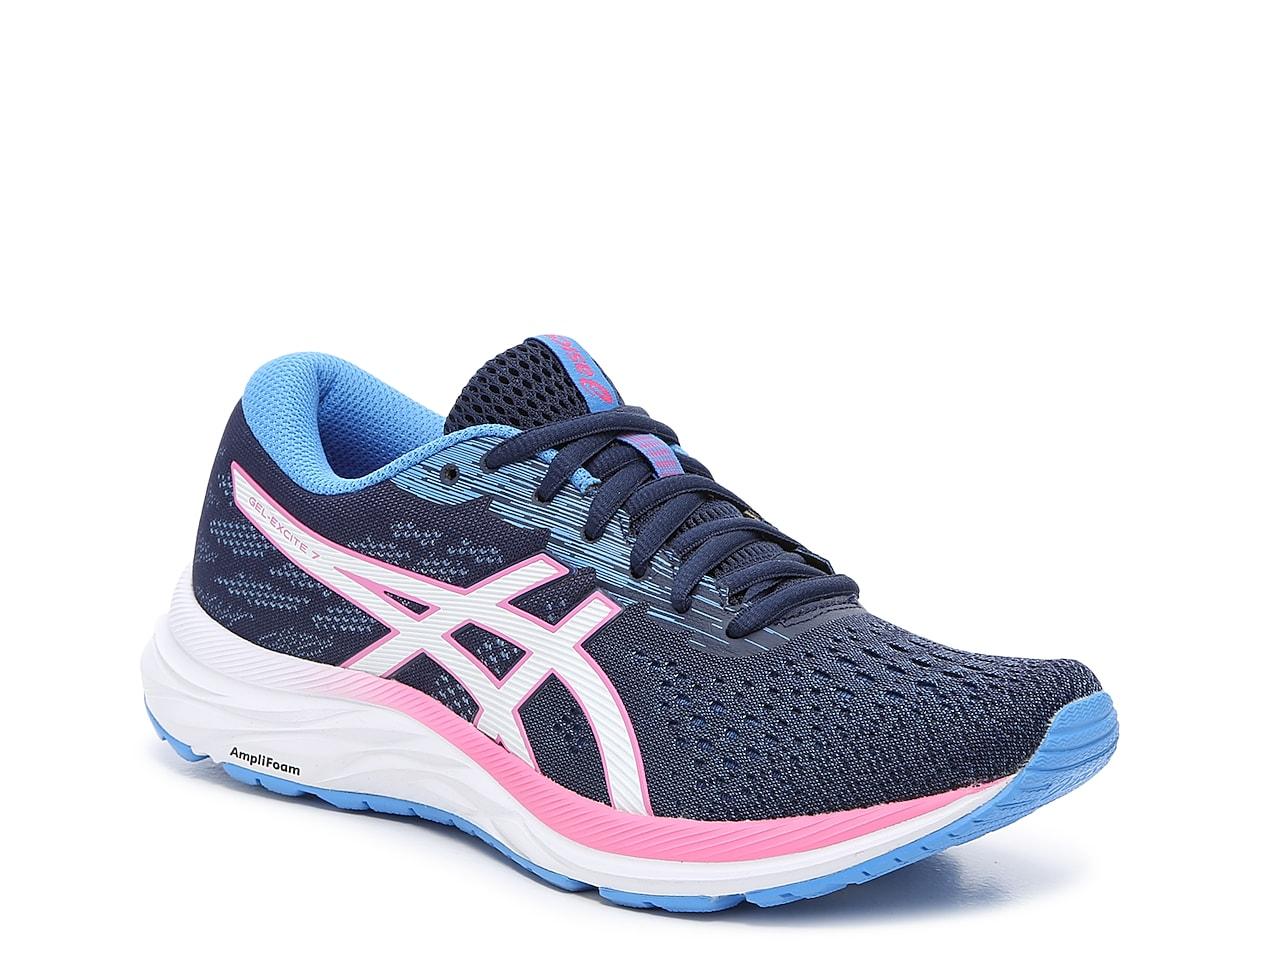 ASICS GEL-Excite 7 Running Shoe - Women's